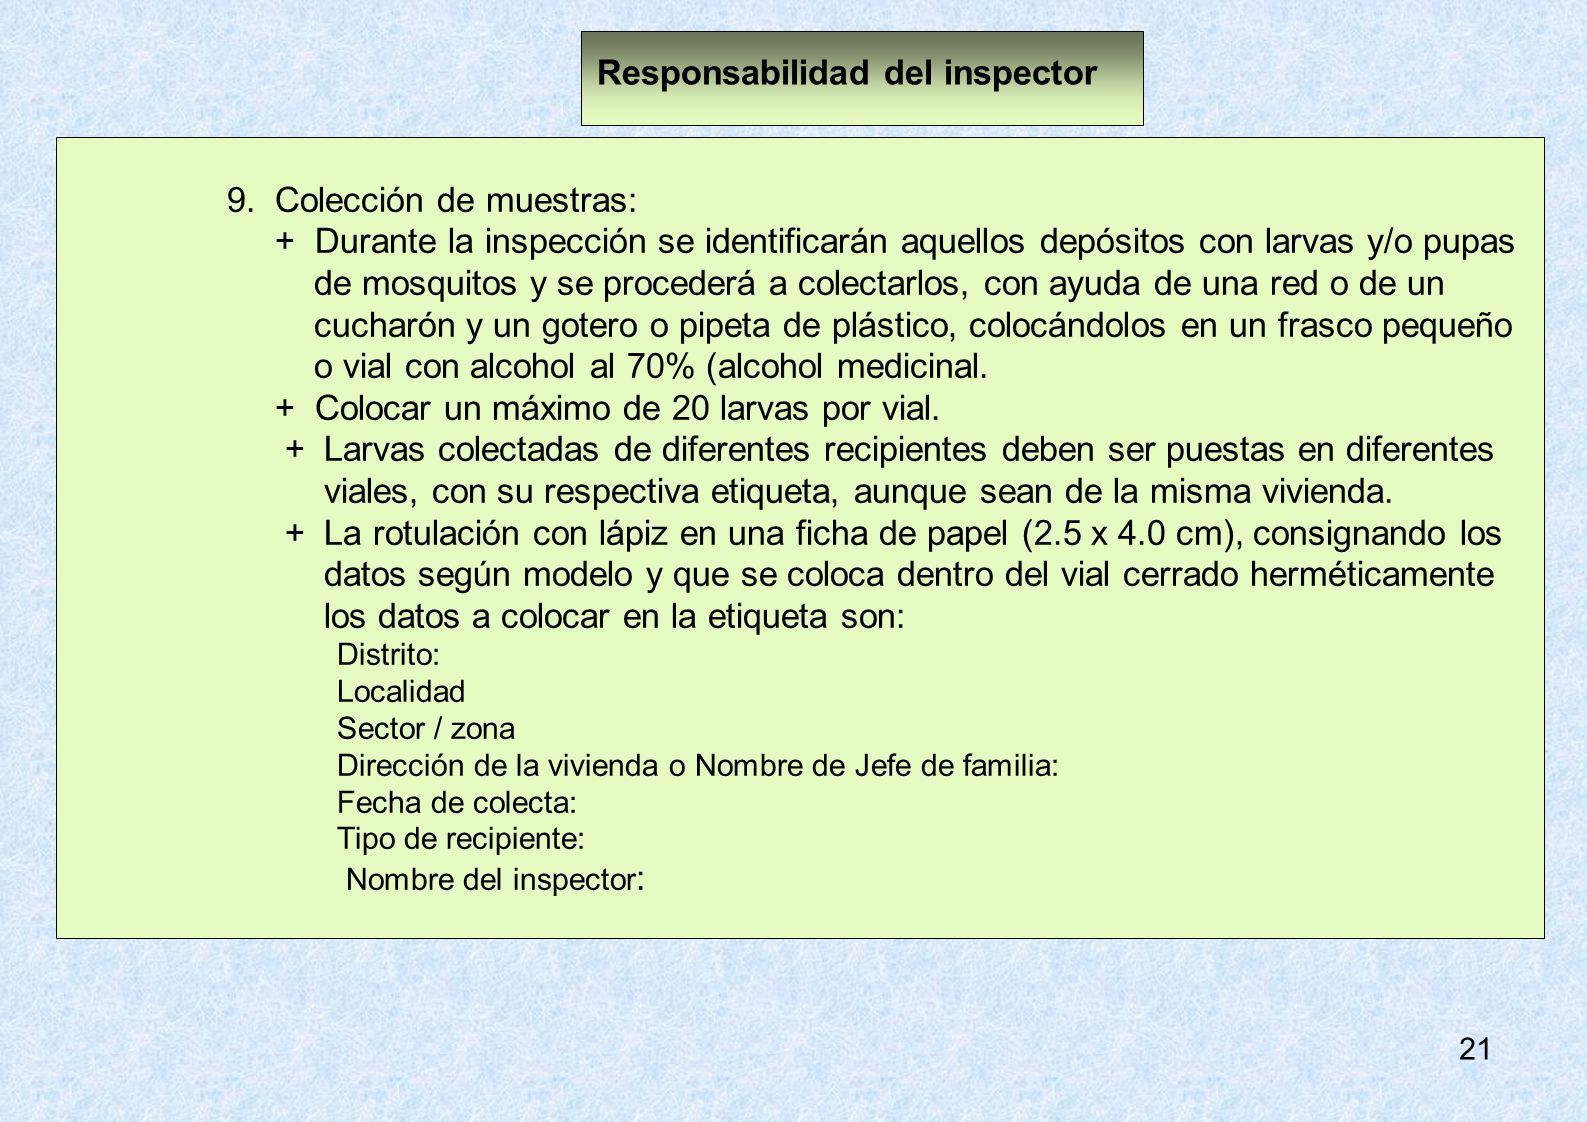 Responsabilidad del inspector